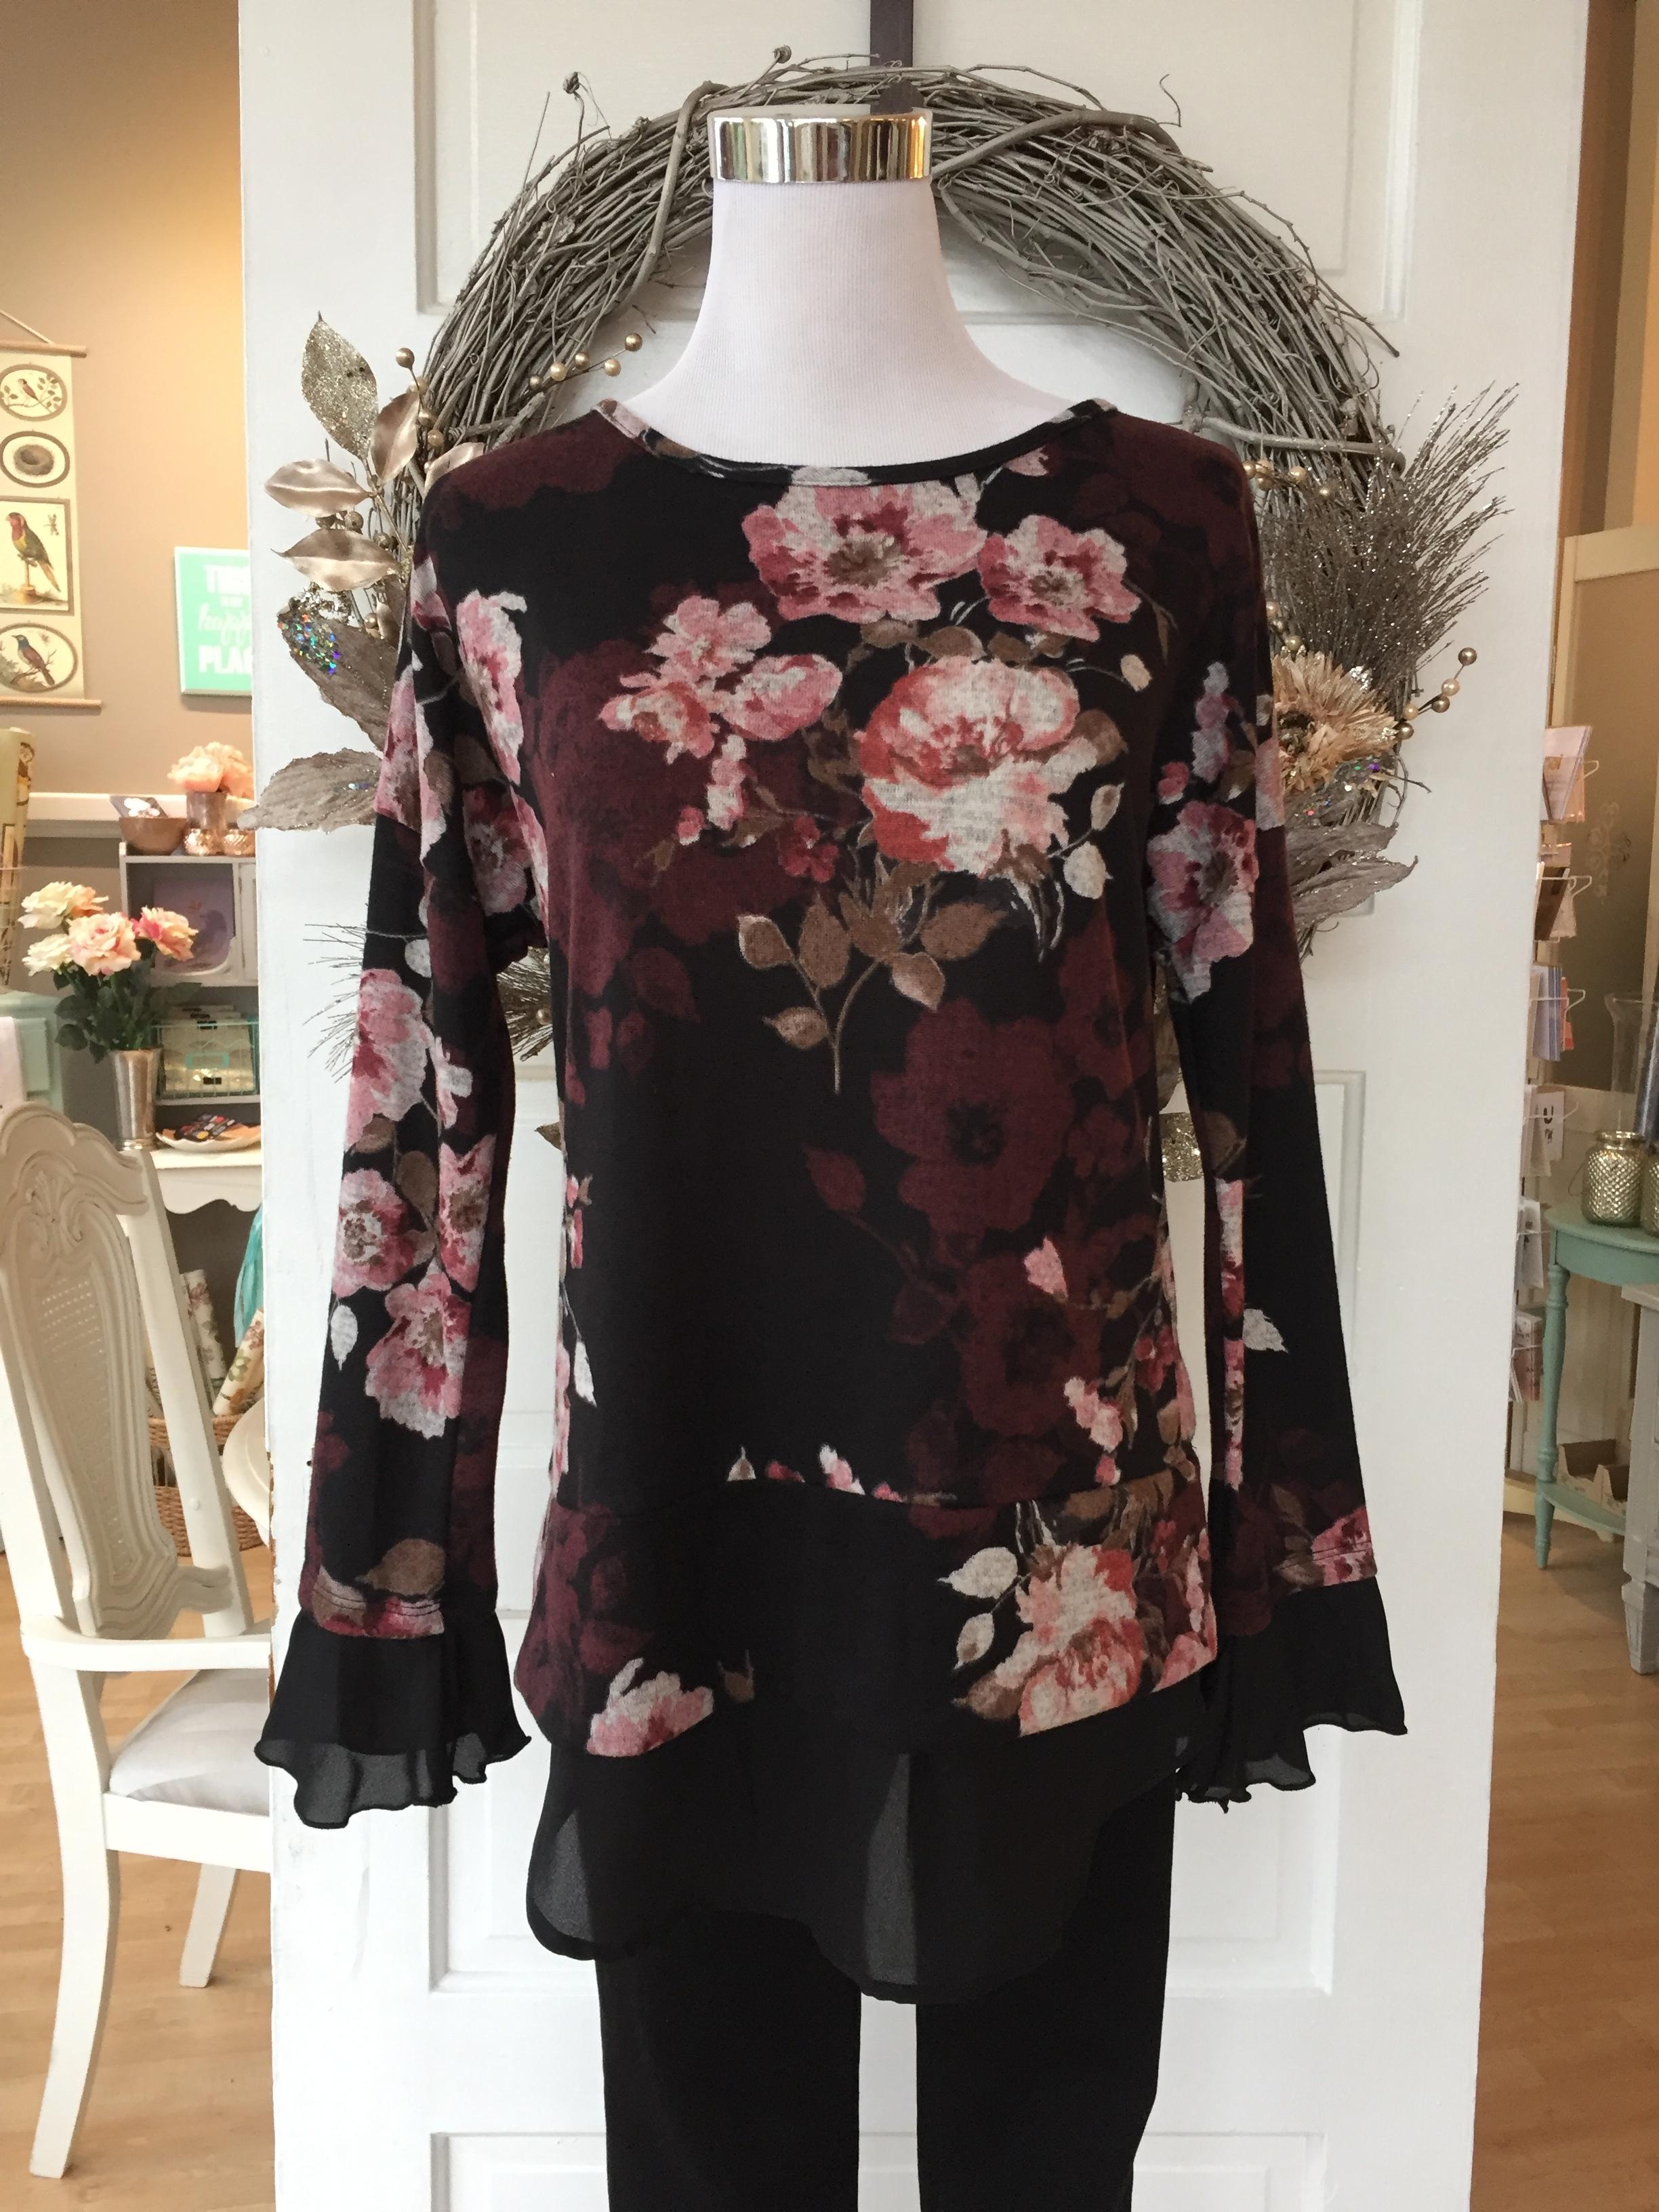 Black Floral Top $34